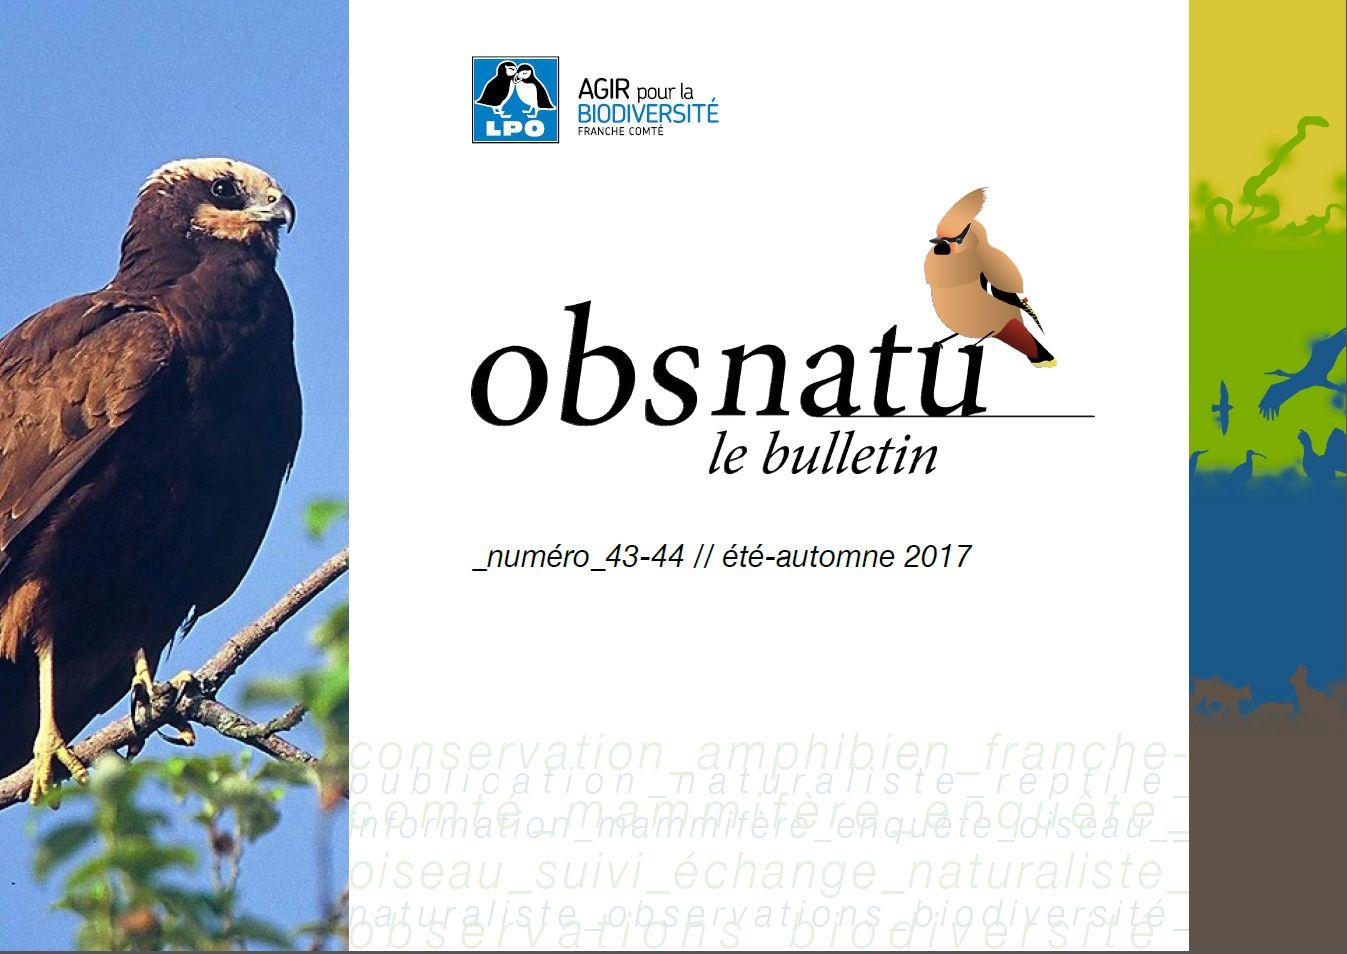 https://cdnfiles1.biolovision.net/franche-comte.lpo.fr/userfiles/publications/Obsnatubulls/Obsnatn43-44ete-aut2017couv.pdf.jpg